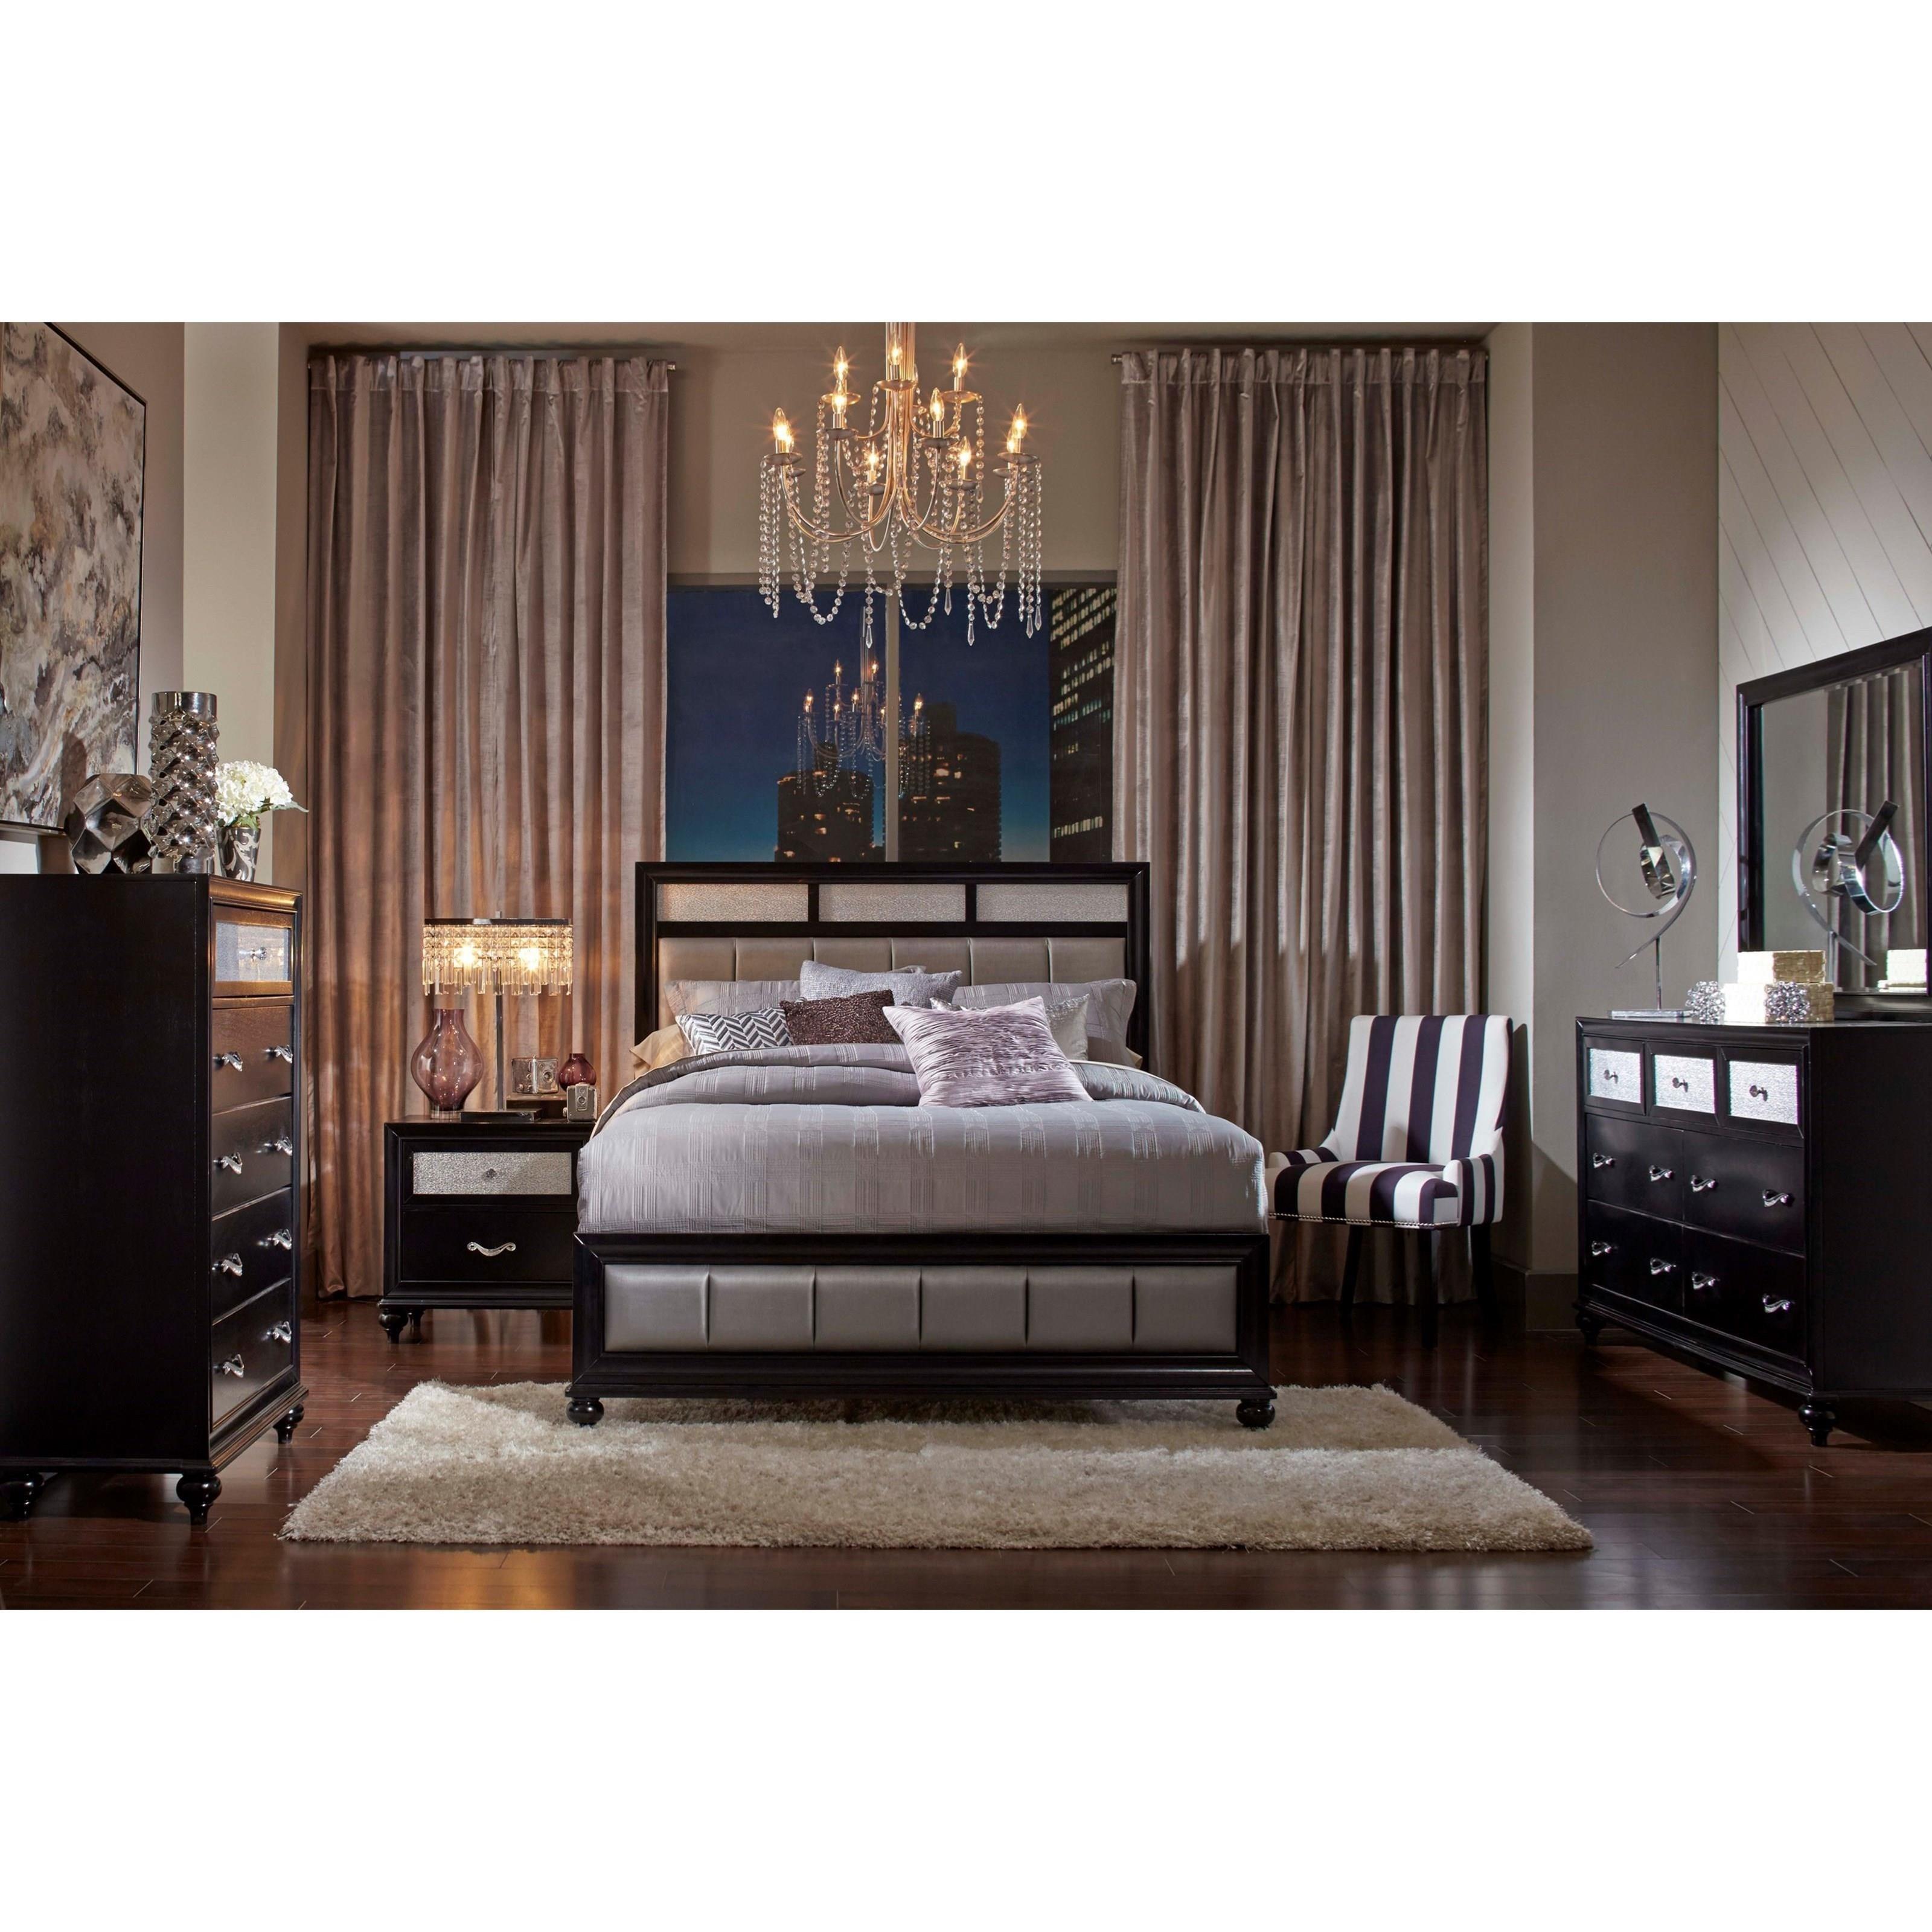 Coaster Barzini King Bed With Metallic Leatherette